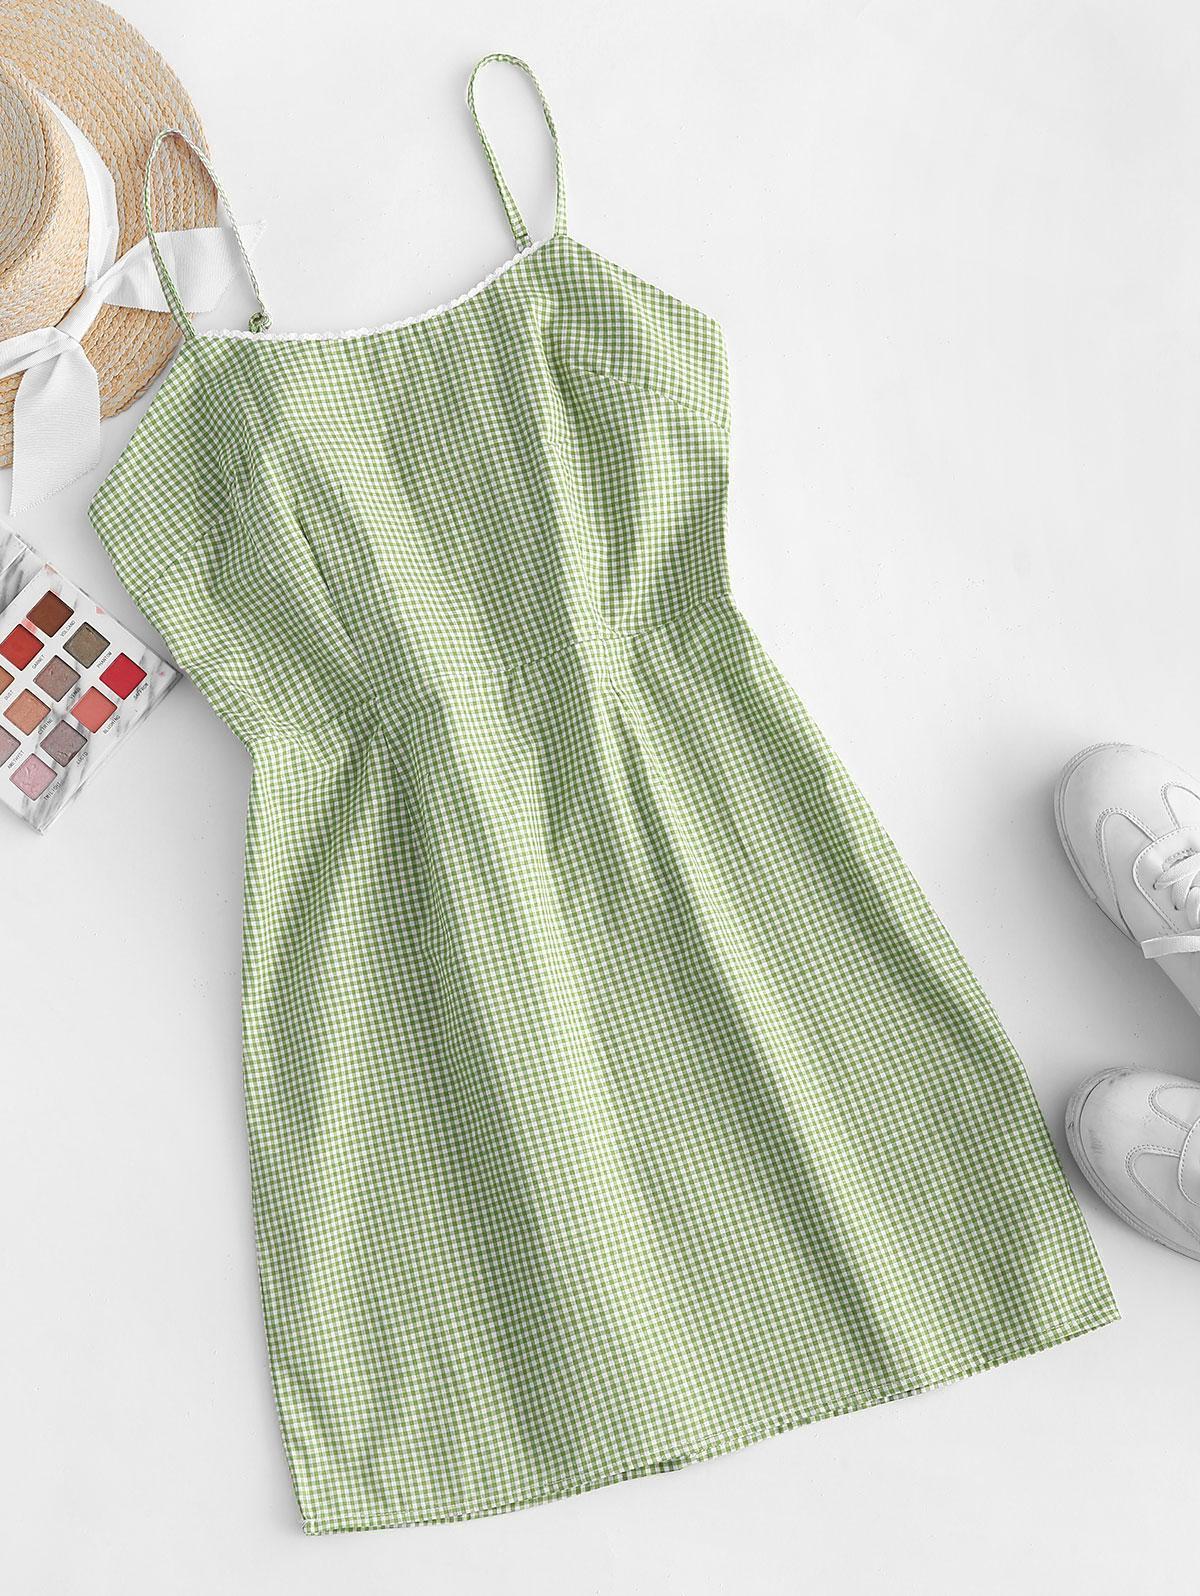 Picot Trim Gingham Cami Dress